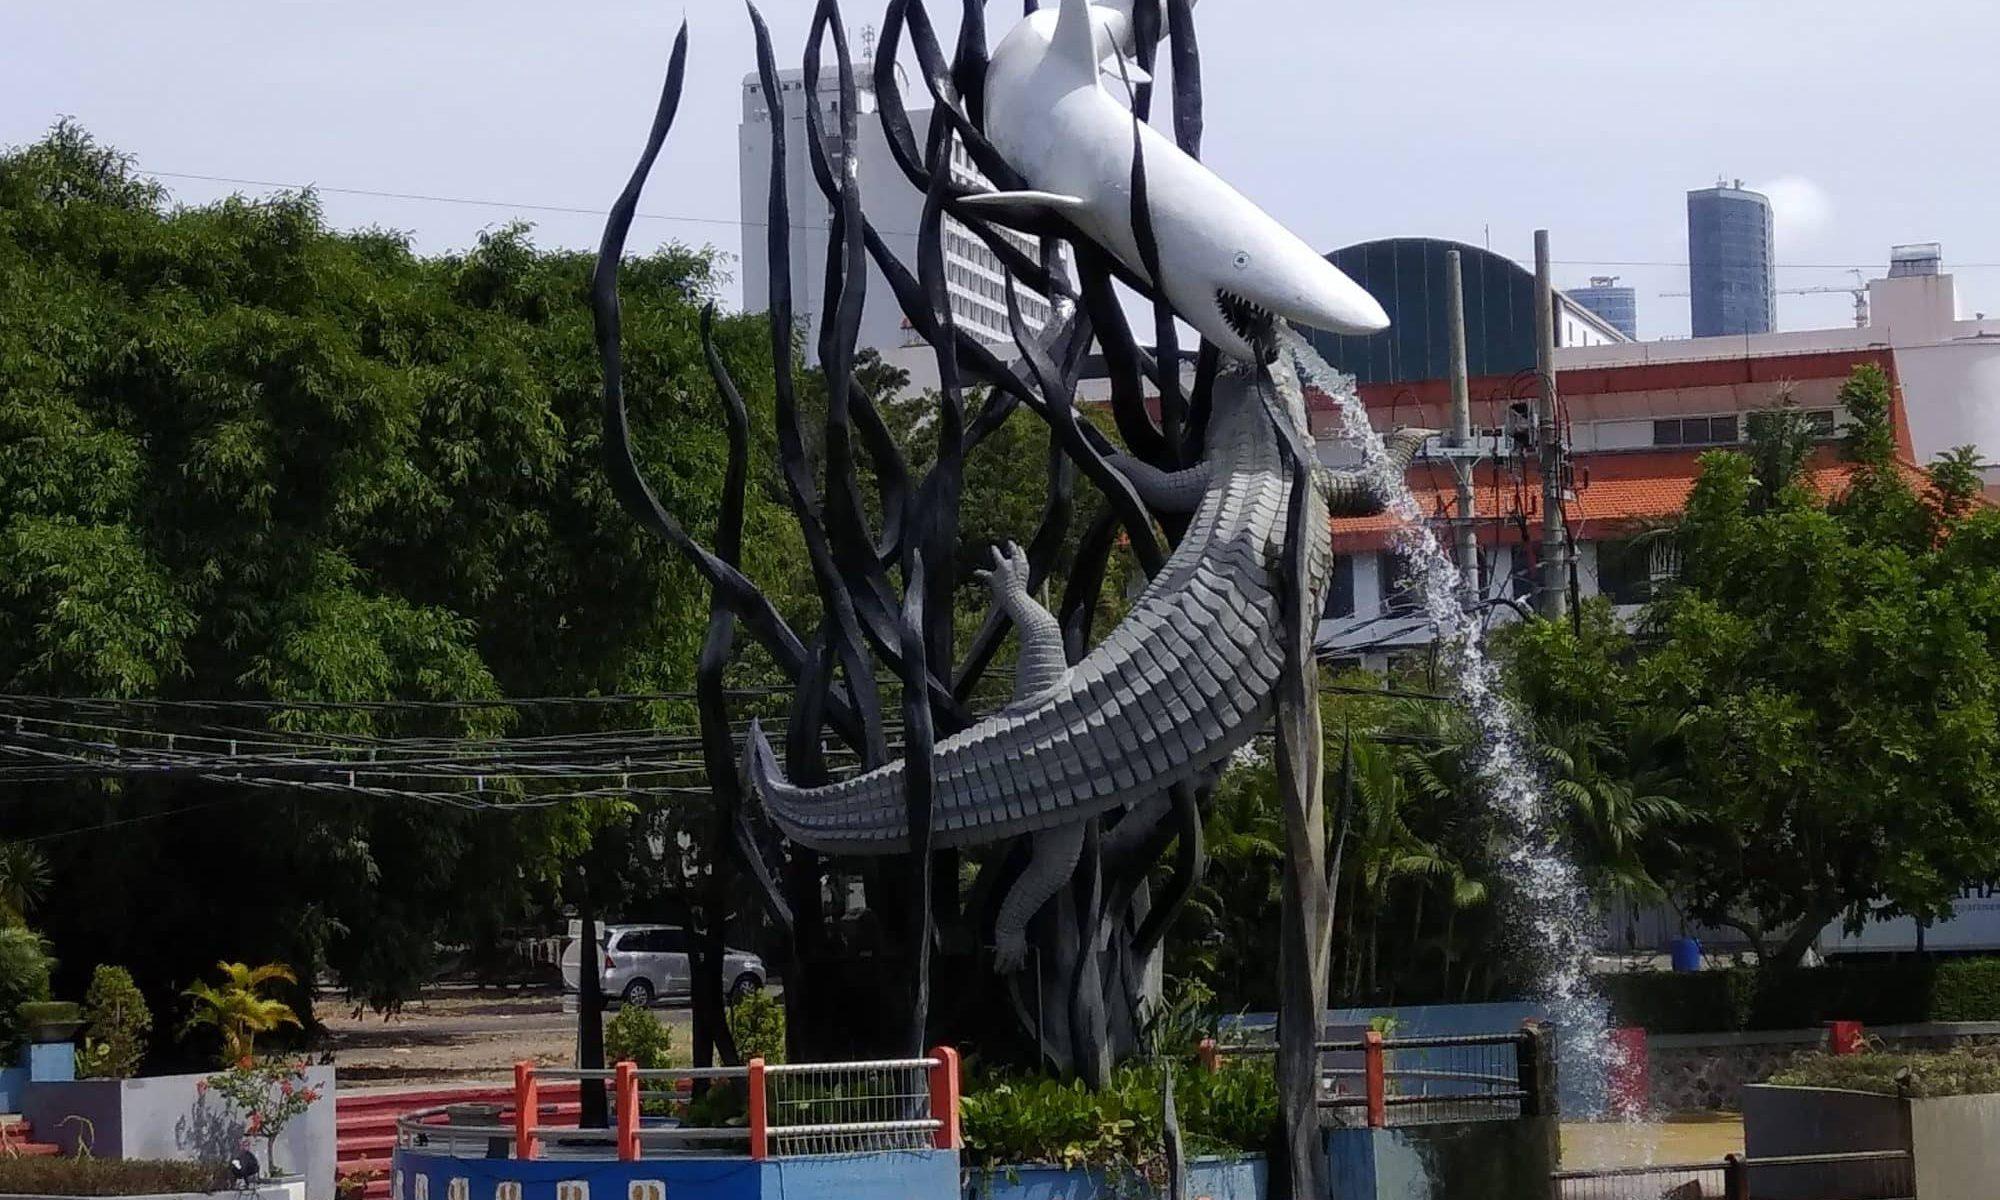 Jalan-Jalan Ke Surabaya